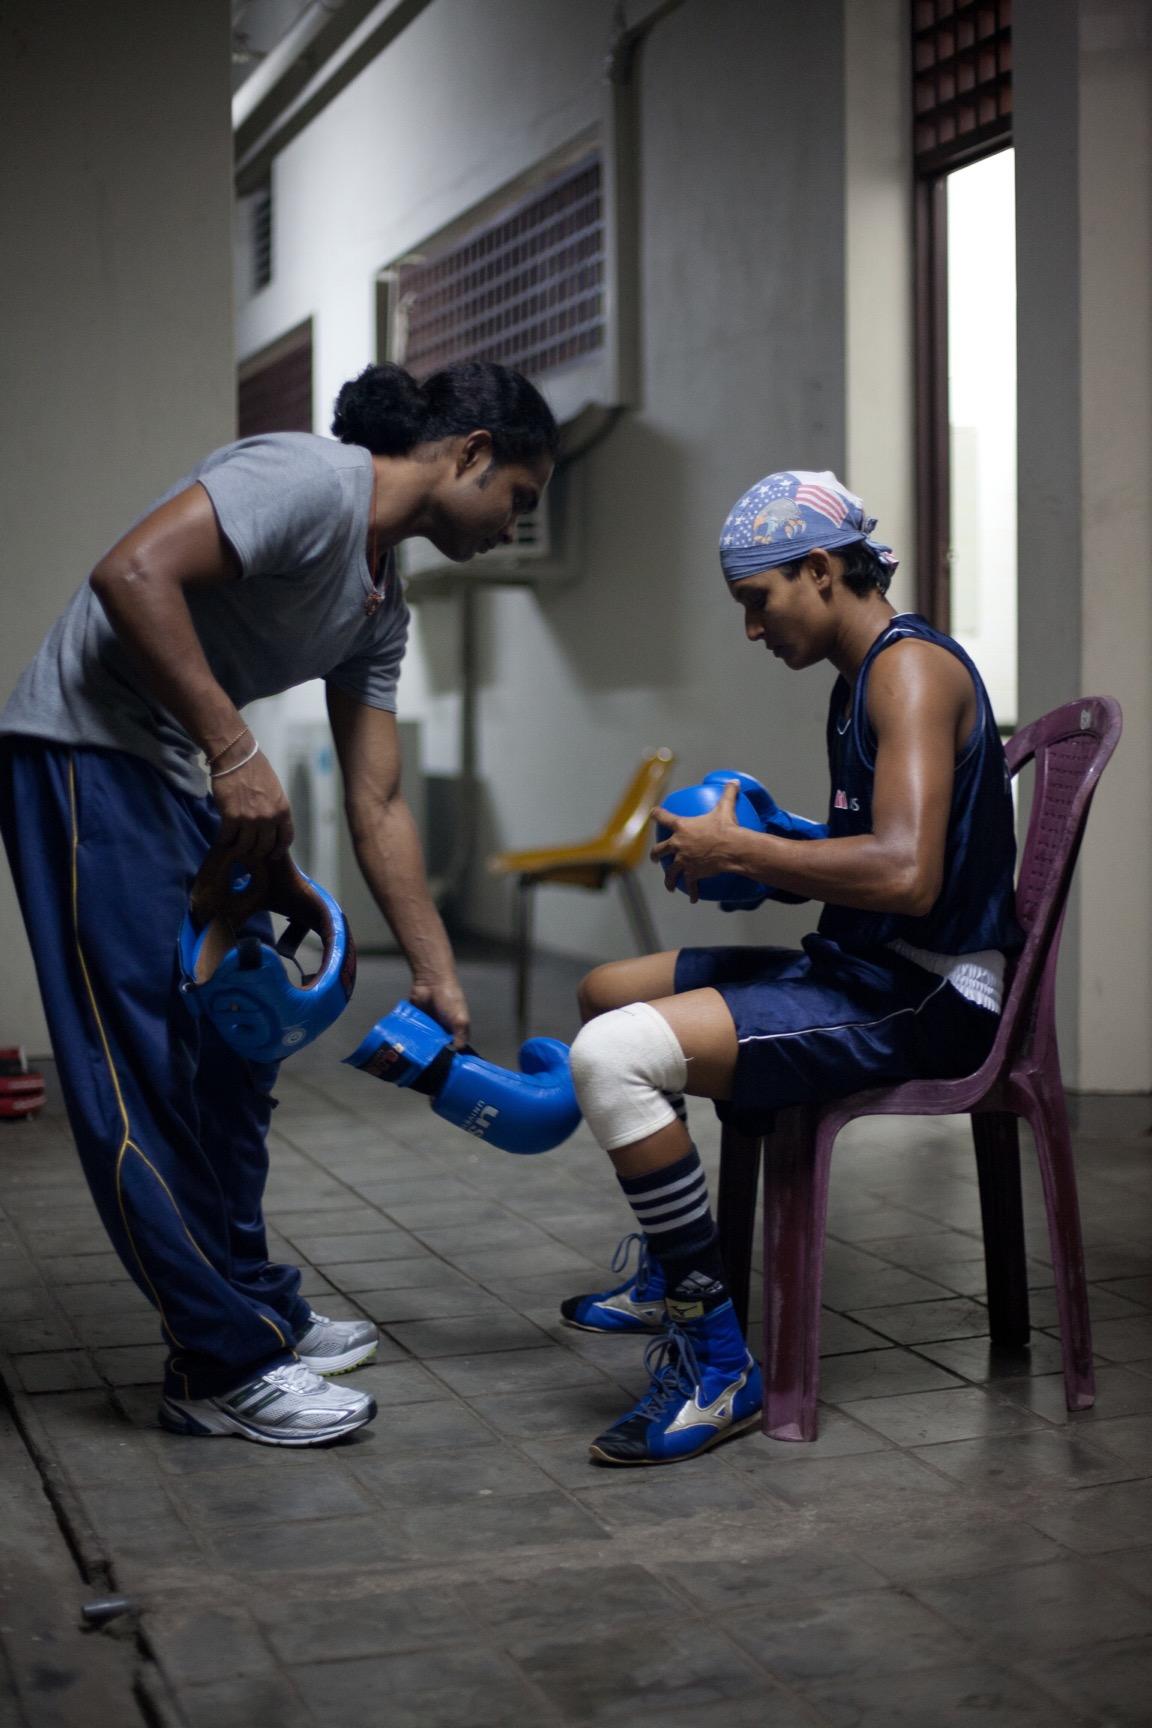 Anusha Kodituwakku gearing up (© Lee Bazalgette)